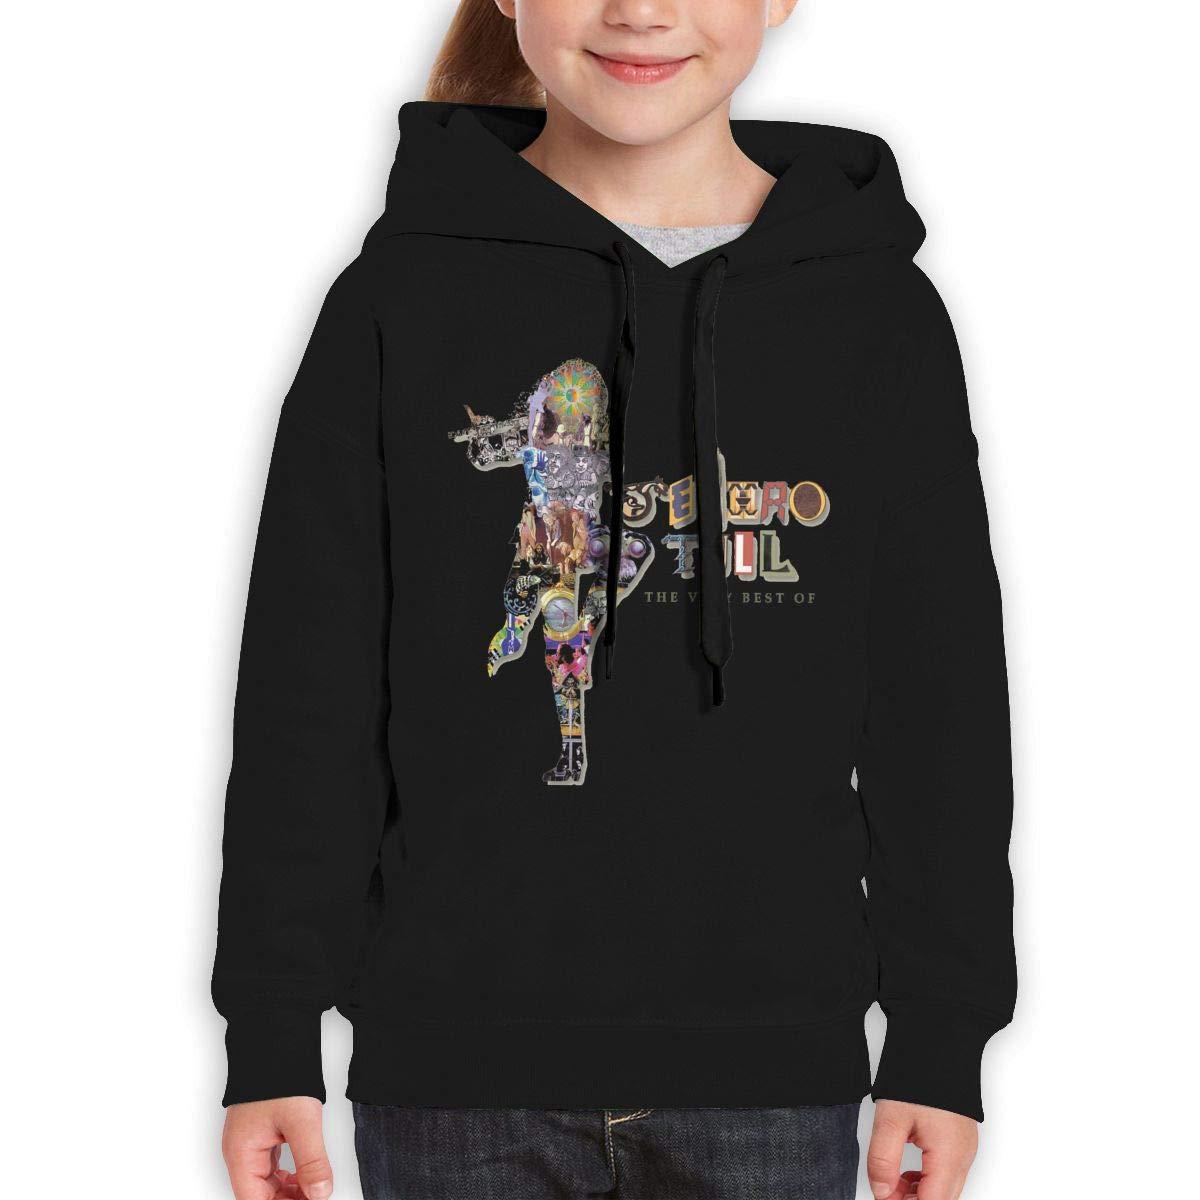 Guiping The Very Best of Jethro Tull Teen Hooded Sweate Sweatshirt Black